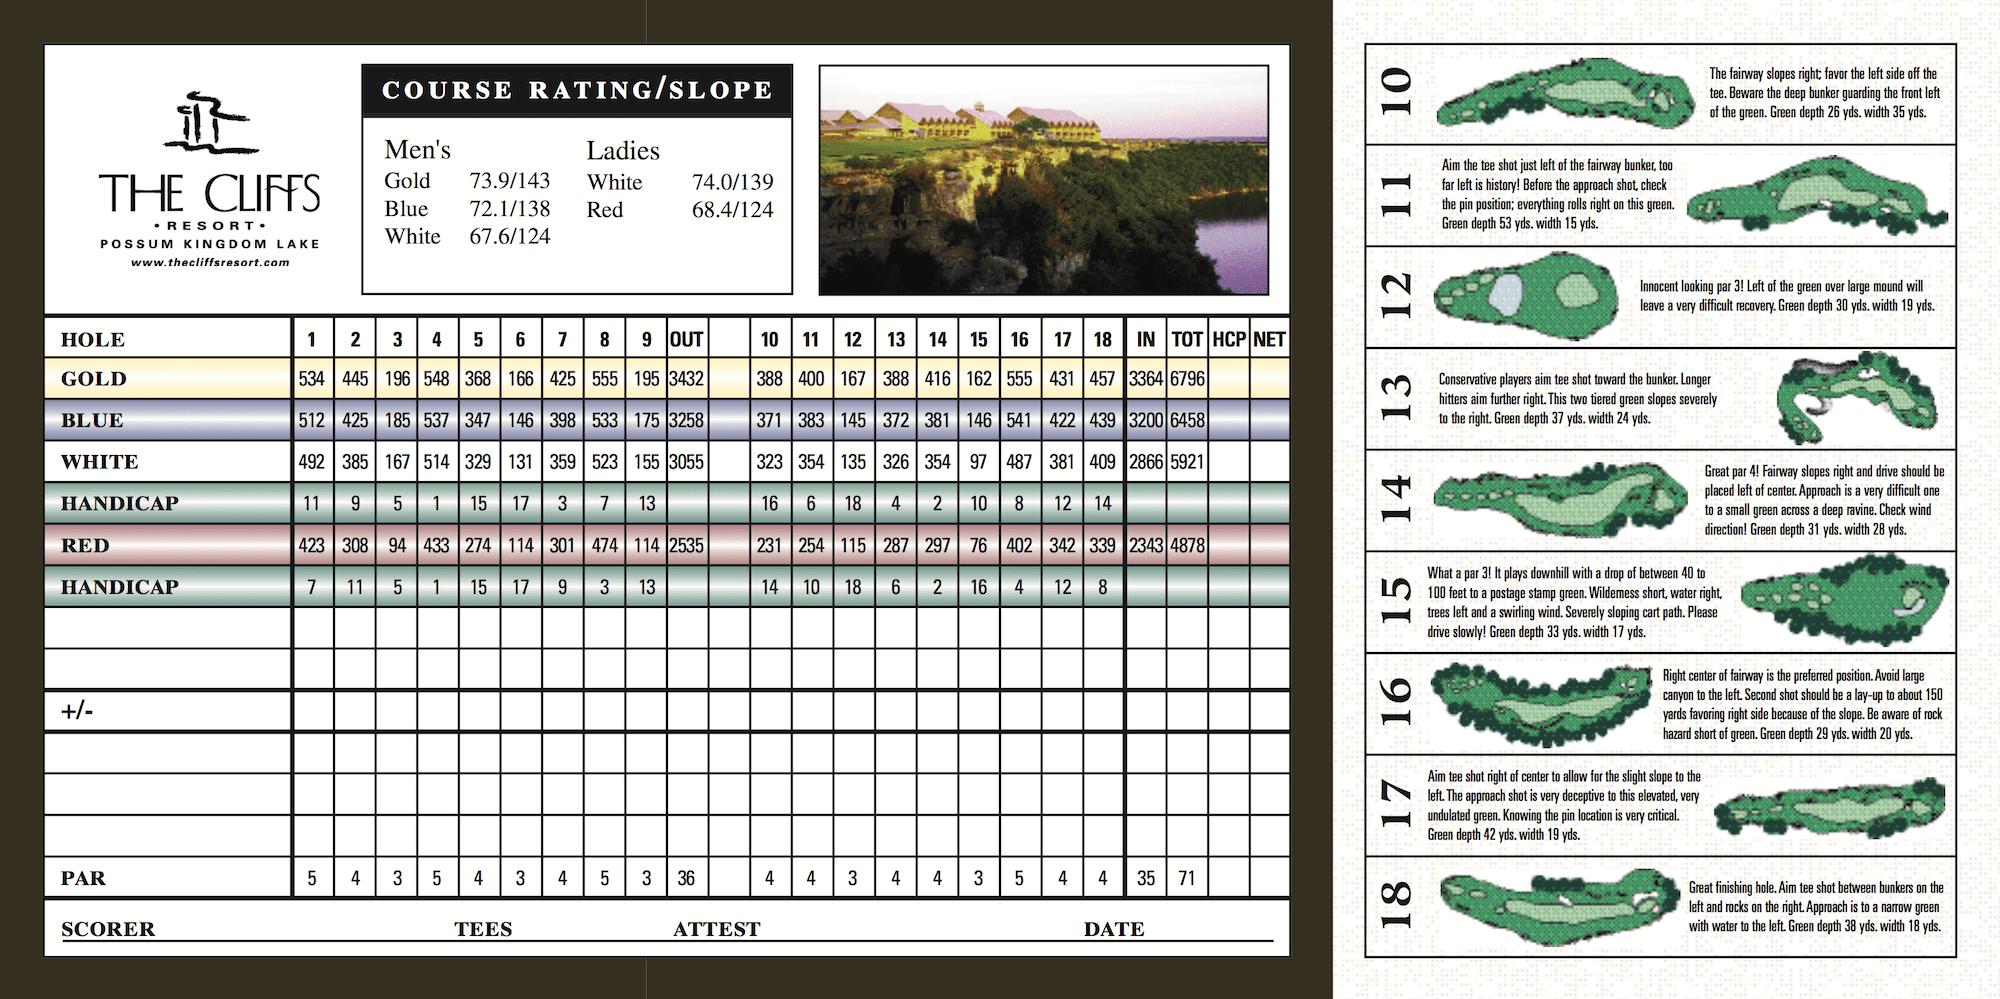 Image of The Cliffs scorecard